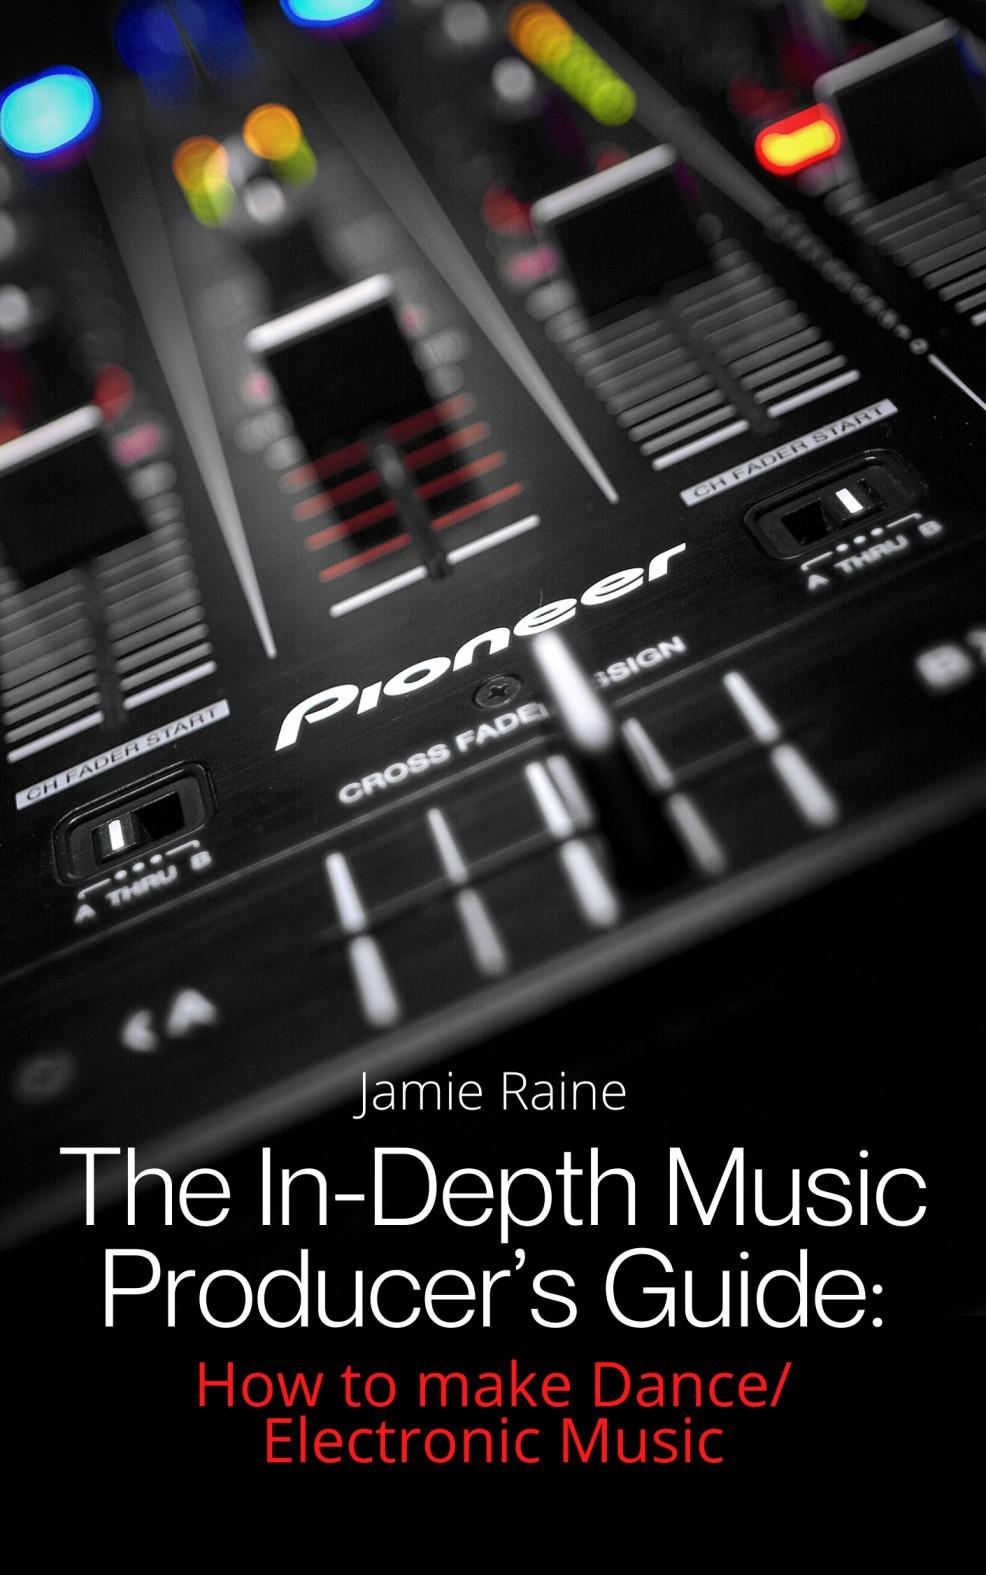 Jamie Raine and his book